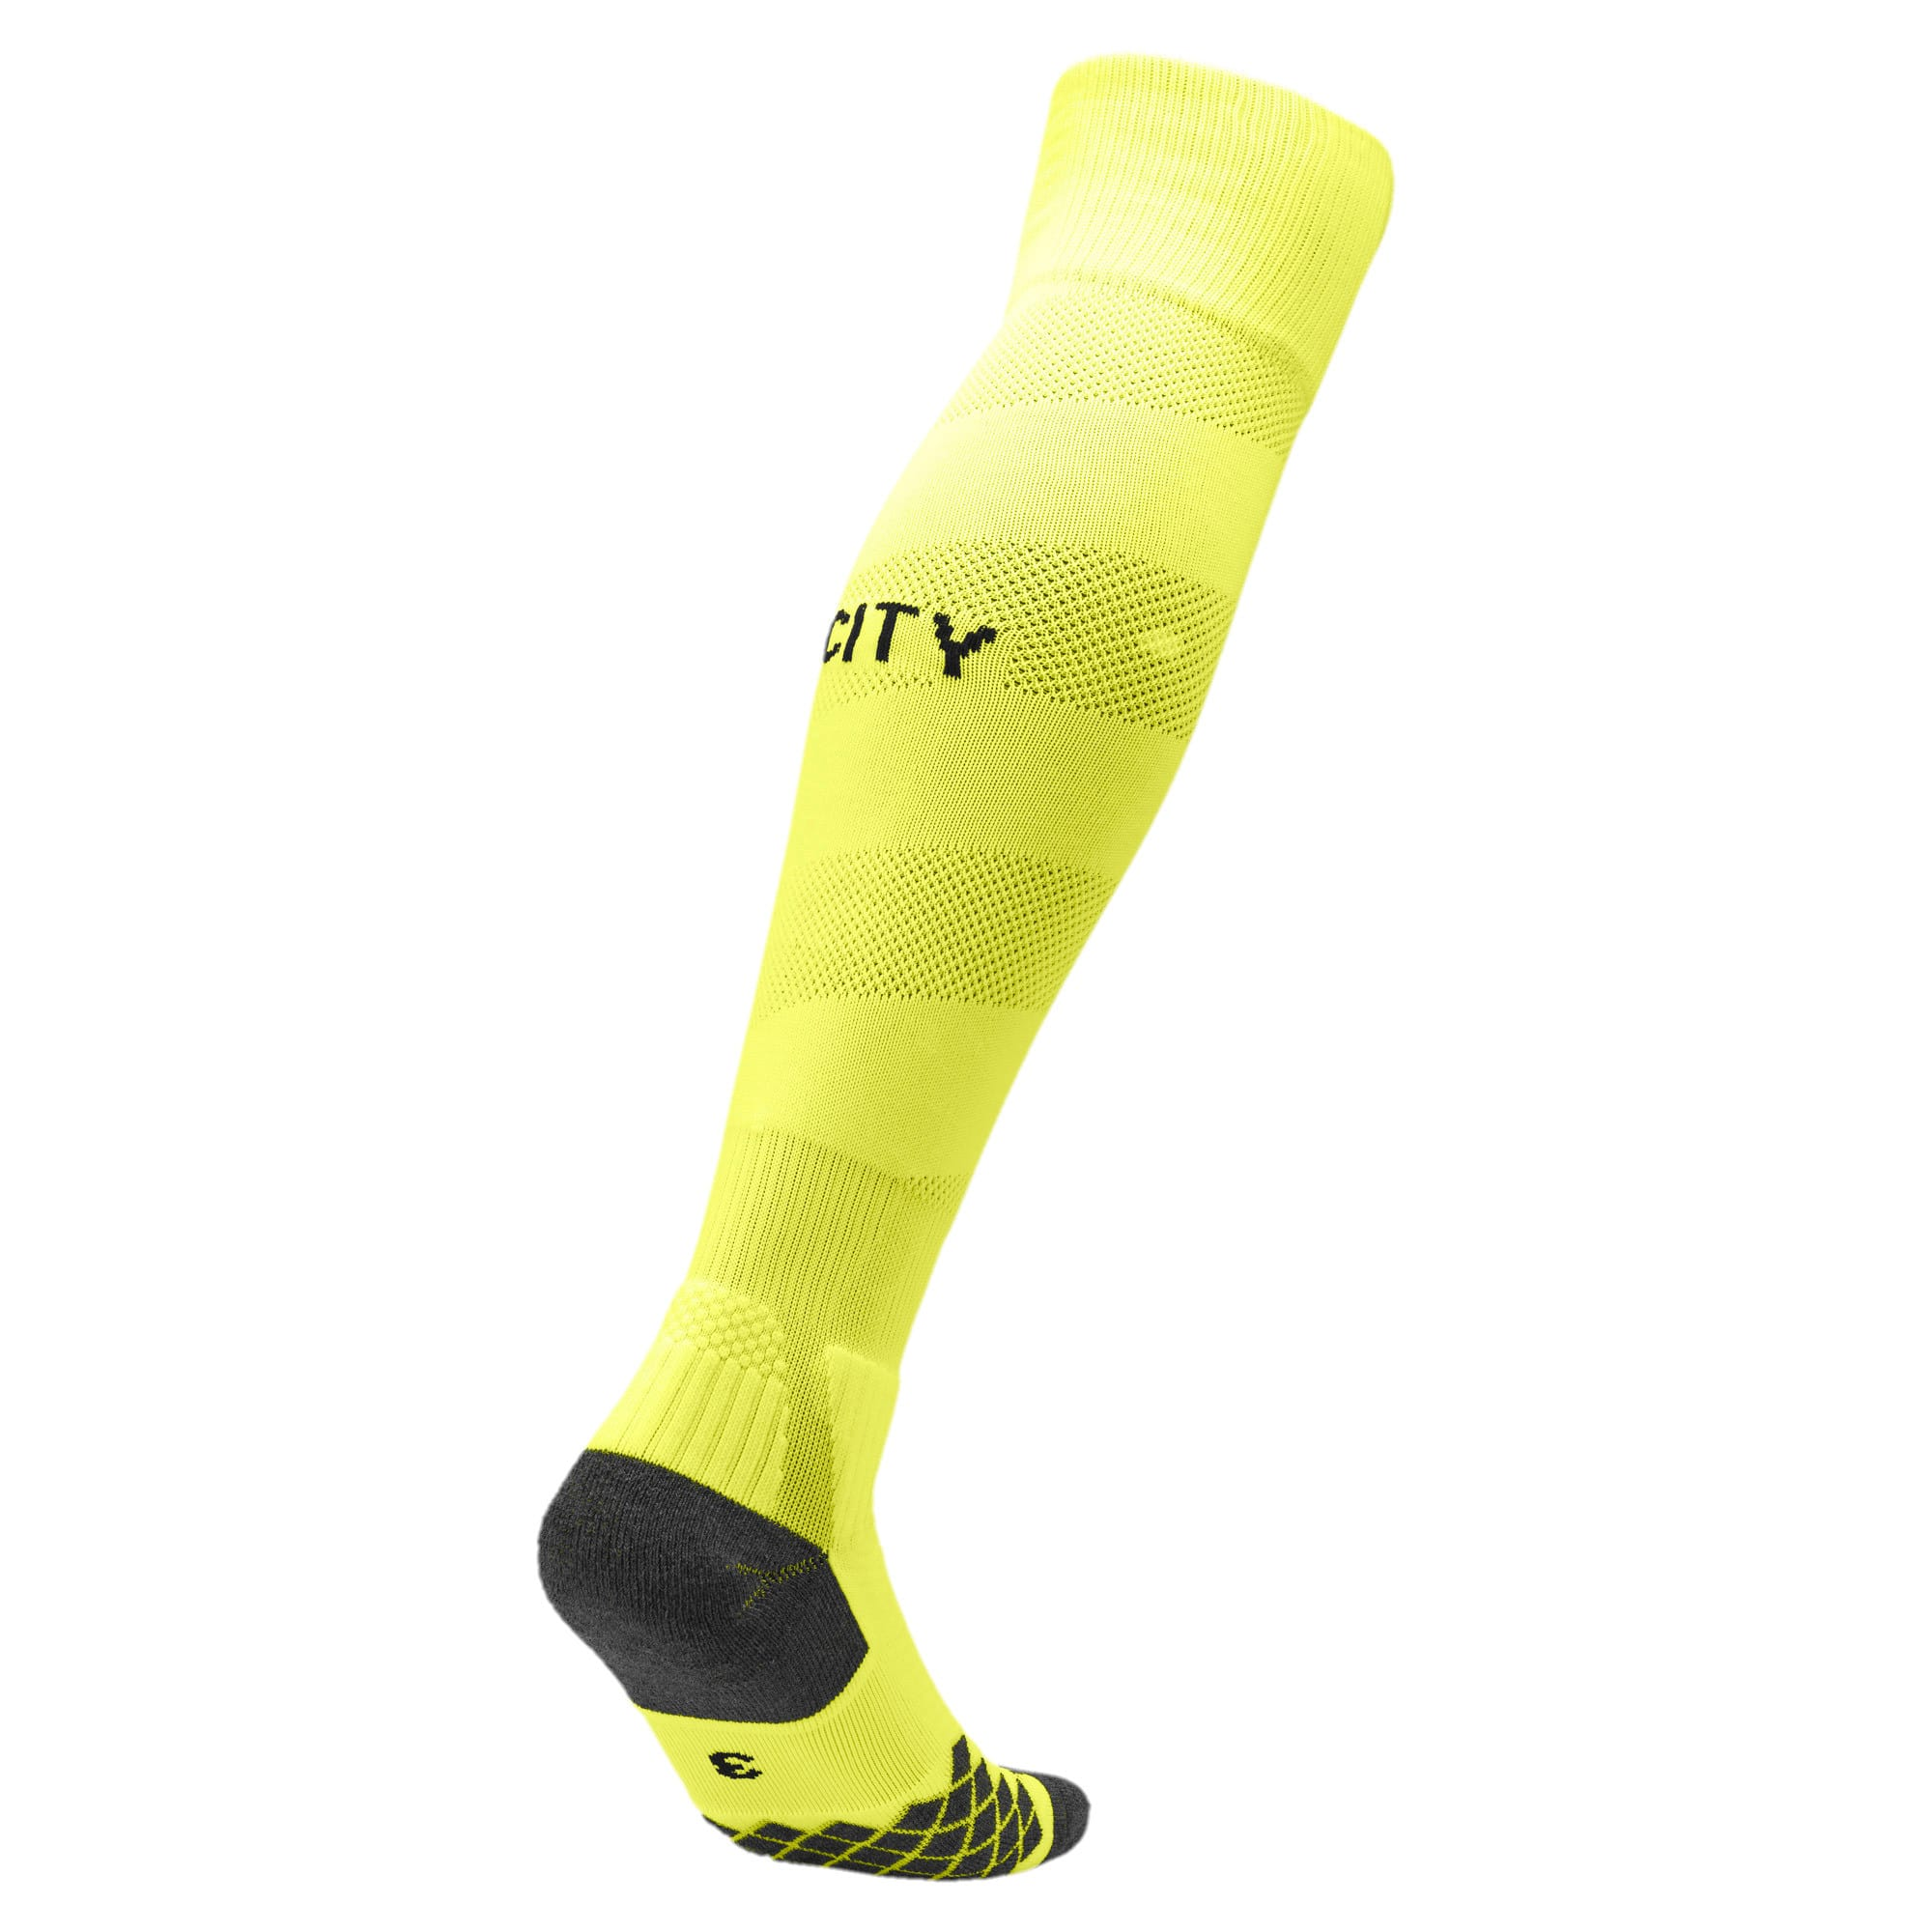 Thumbnail 2 of Man City Spiral Men's Socks, Fizzy Yellow-Puma Black, medium